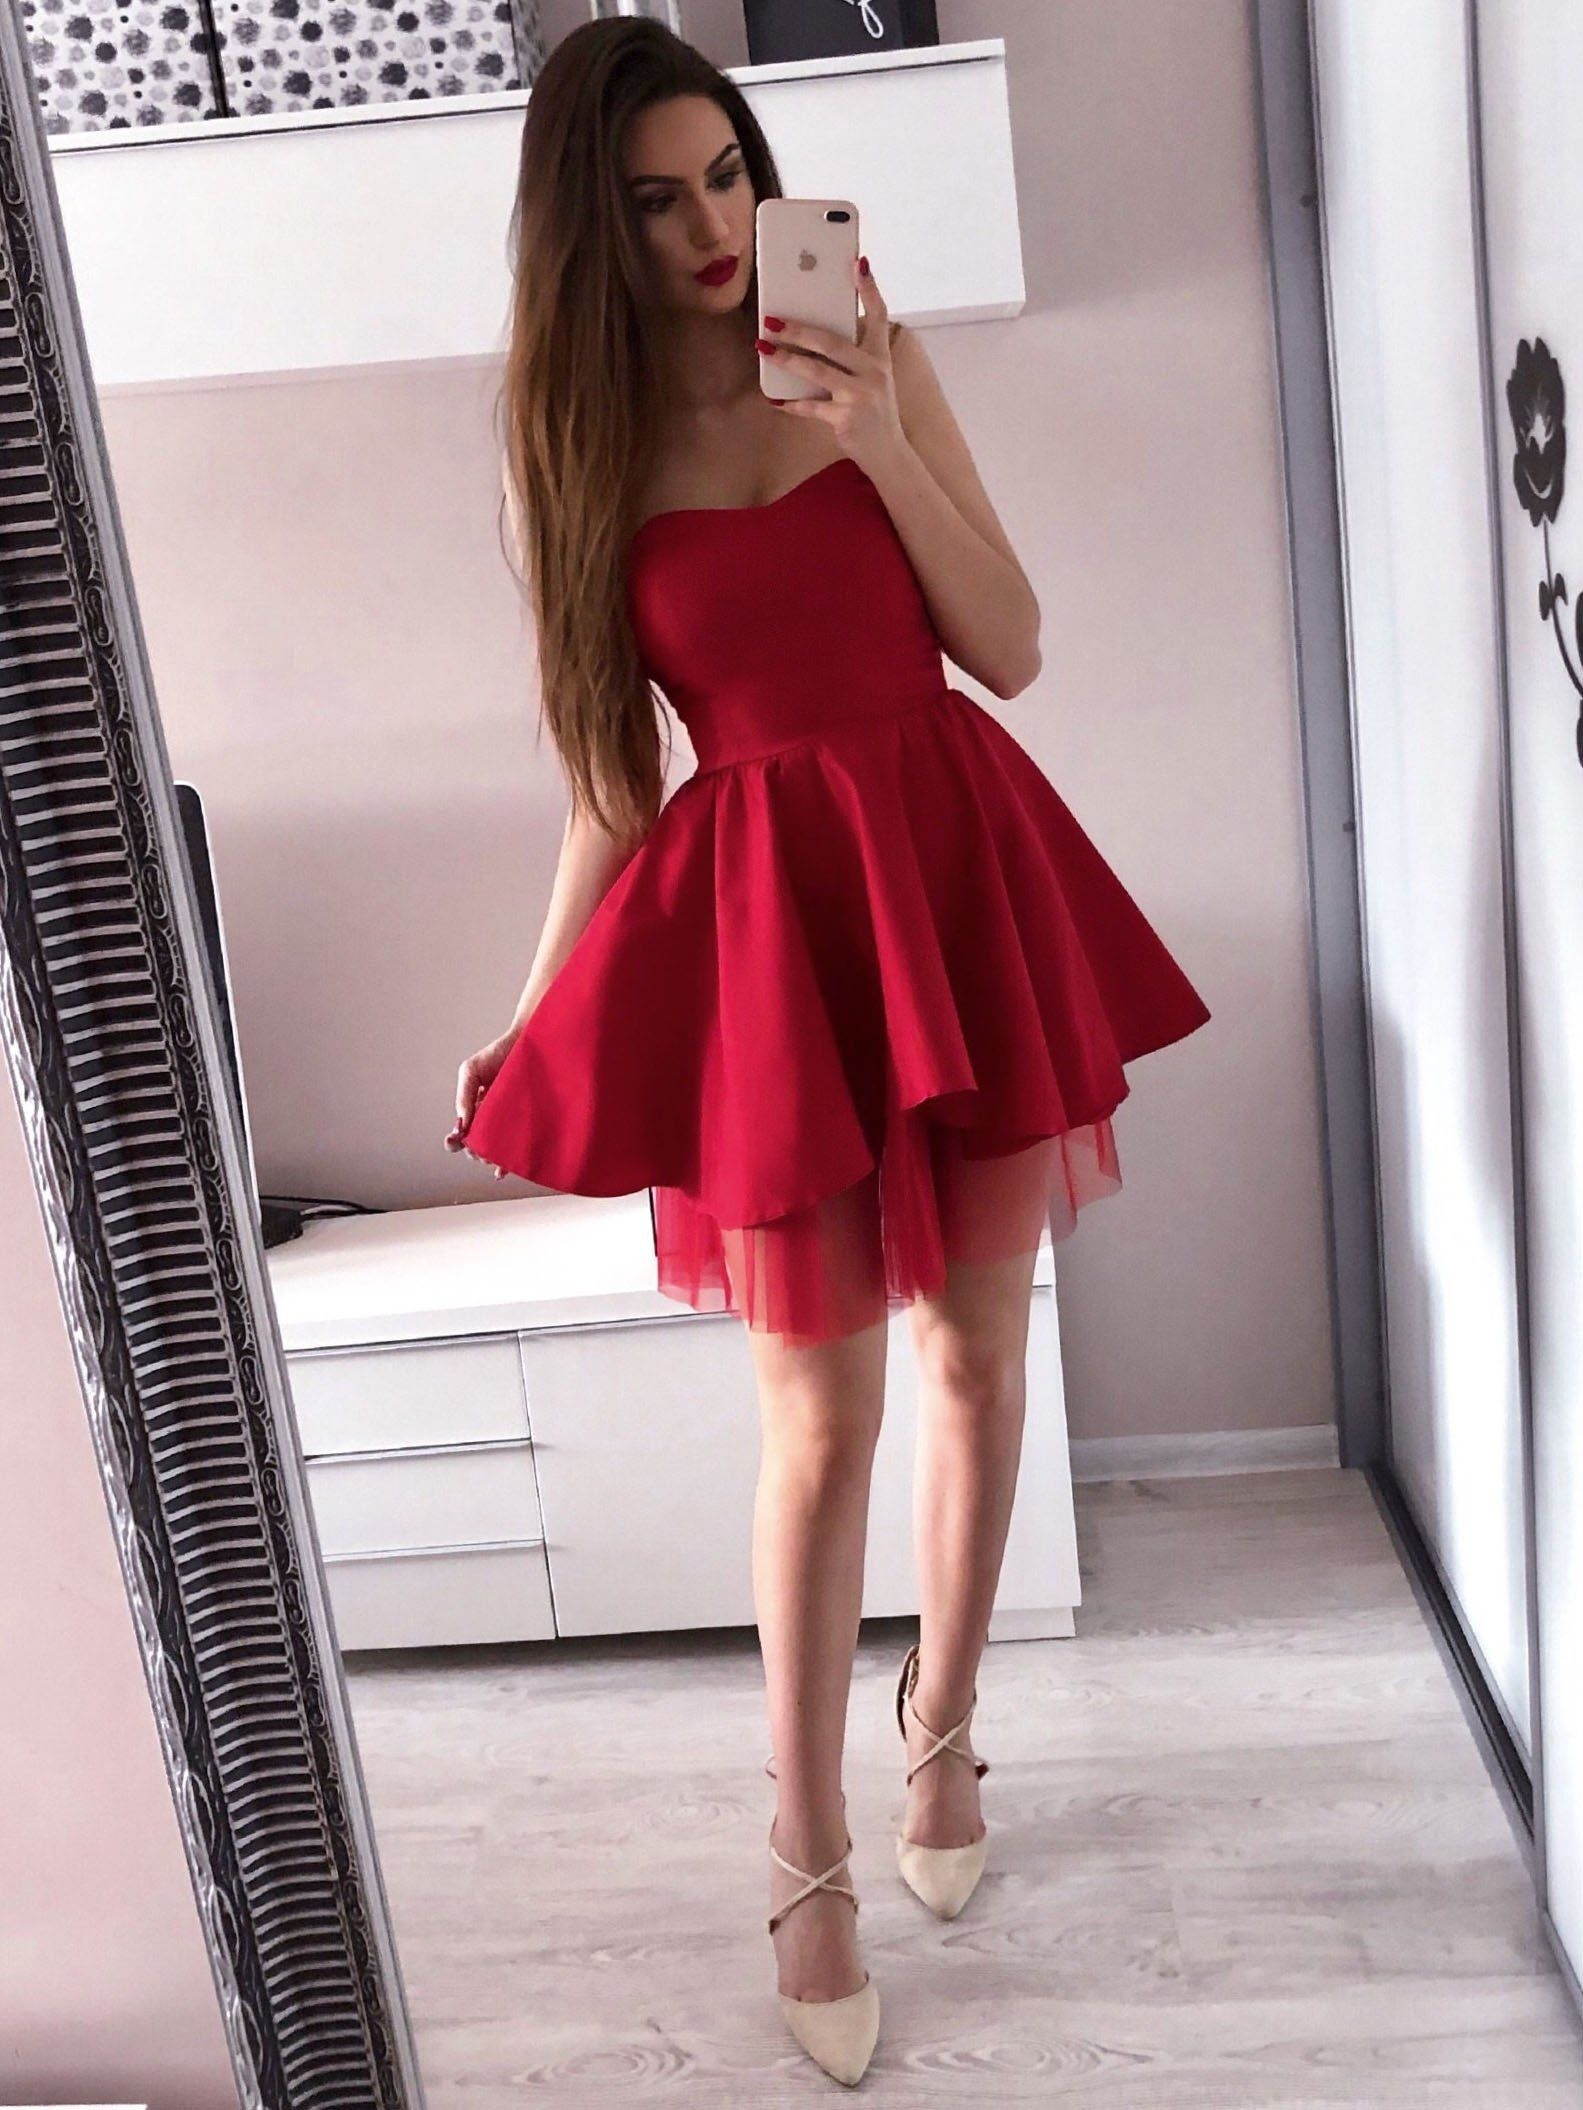 883dd5e984b Sweetheart Neck Red Mini Homecoming Dresses Simple Short Prom Dress ARD1732